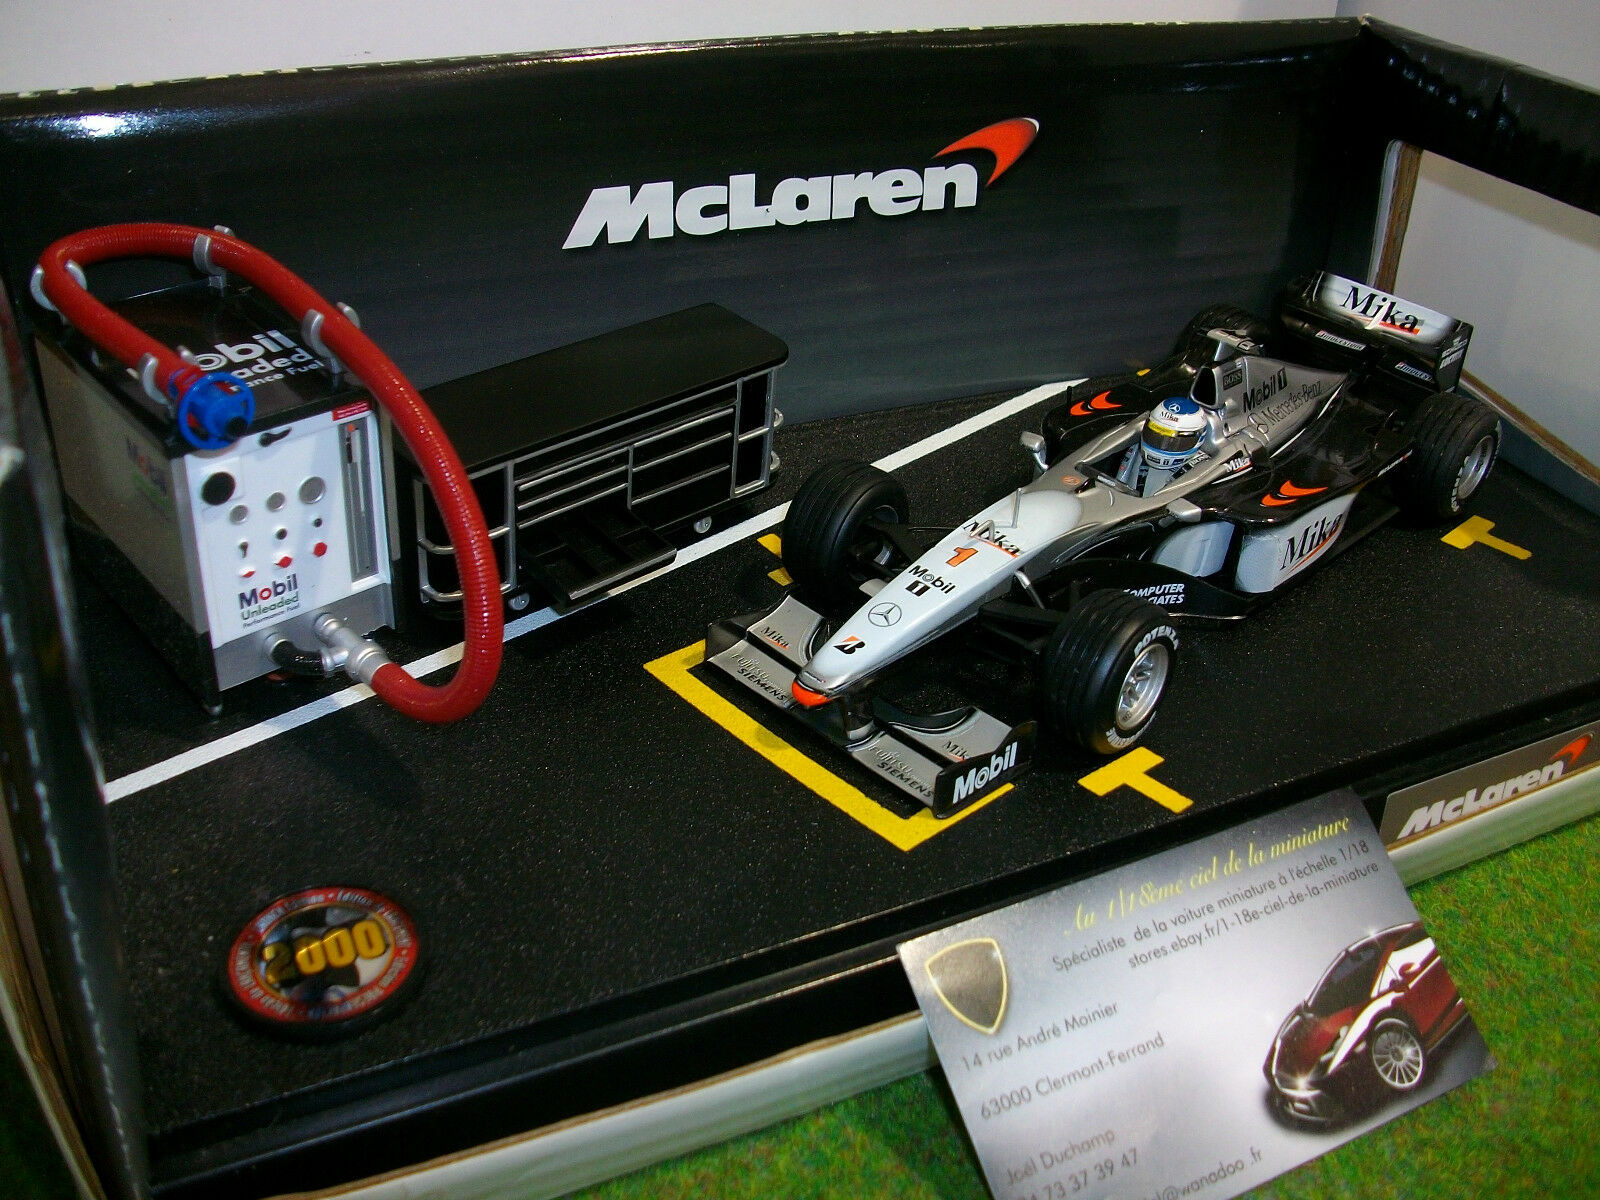 F1 McLAREN MP4-15 HAKKINEN 2000 1 24 HOT WHEELS MATTEL 26698 formule 1 PIT STOP